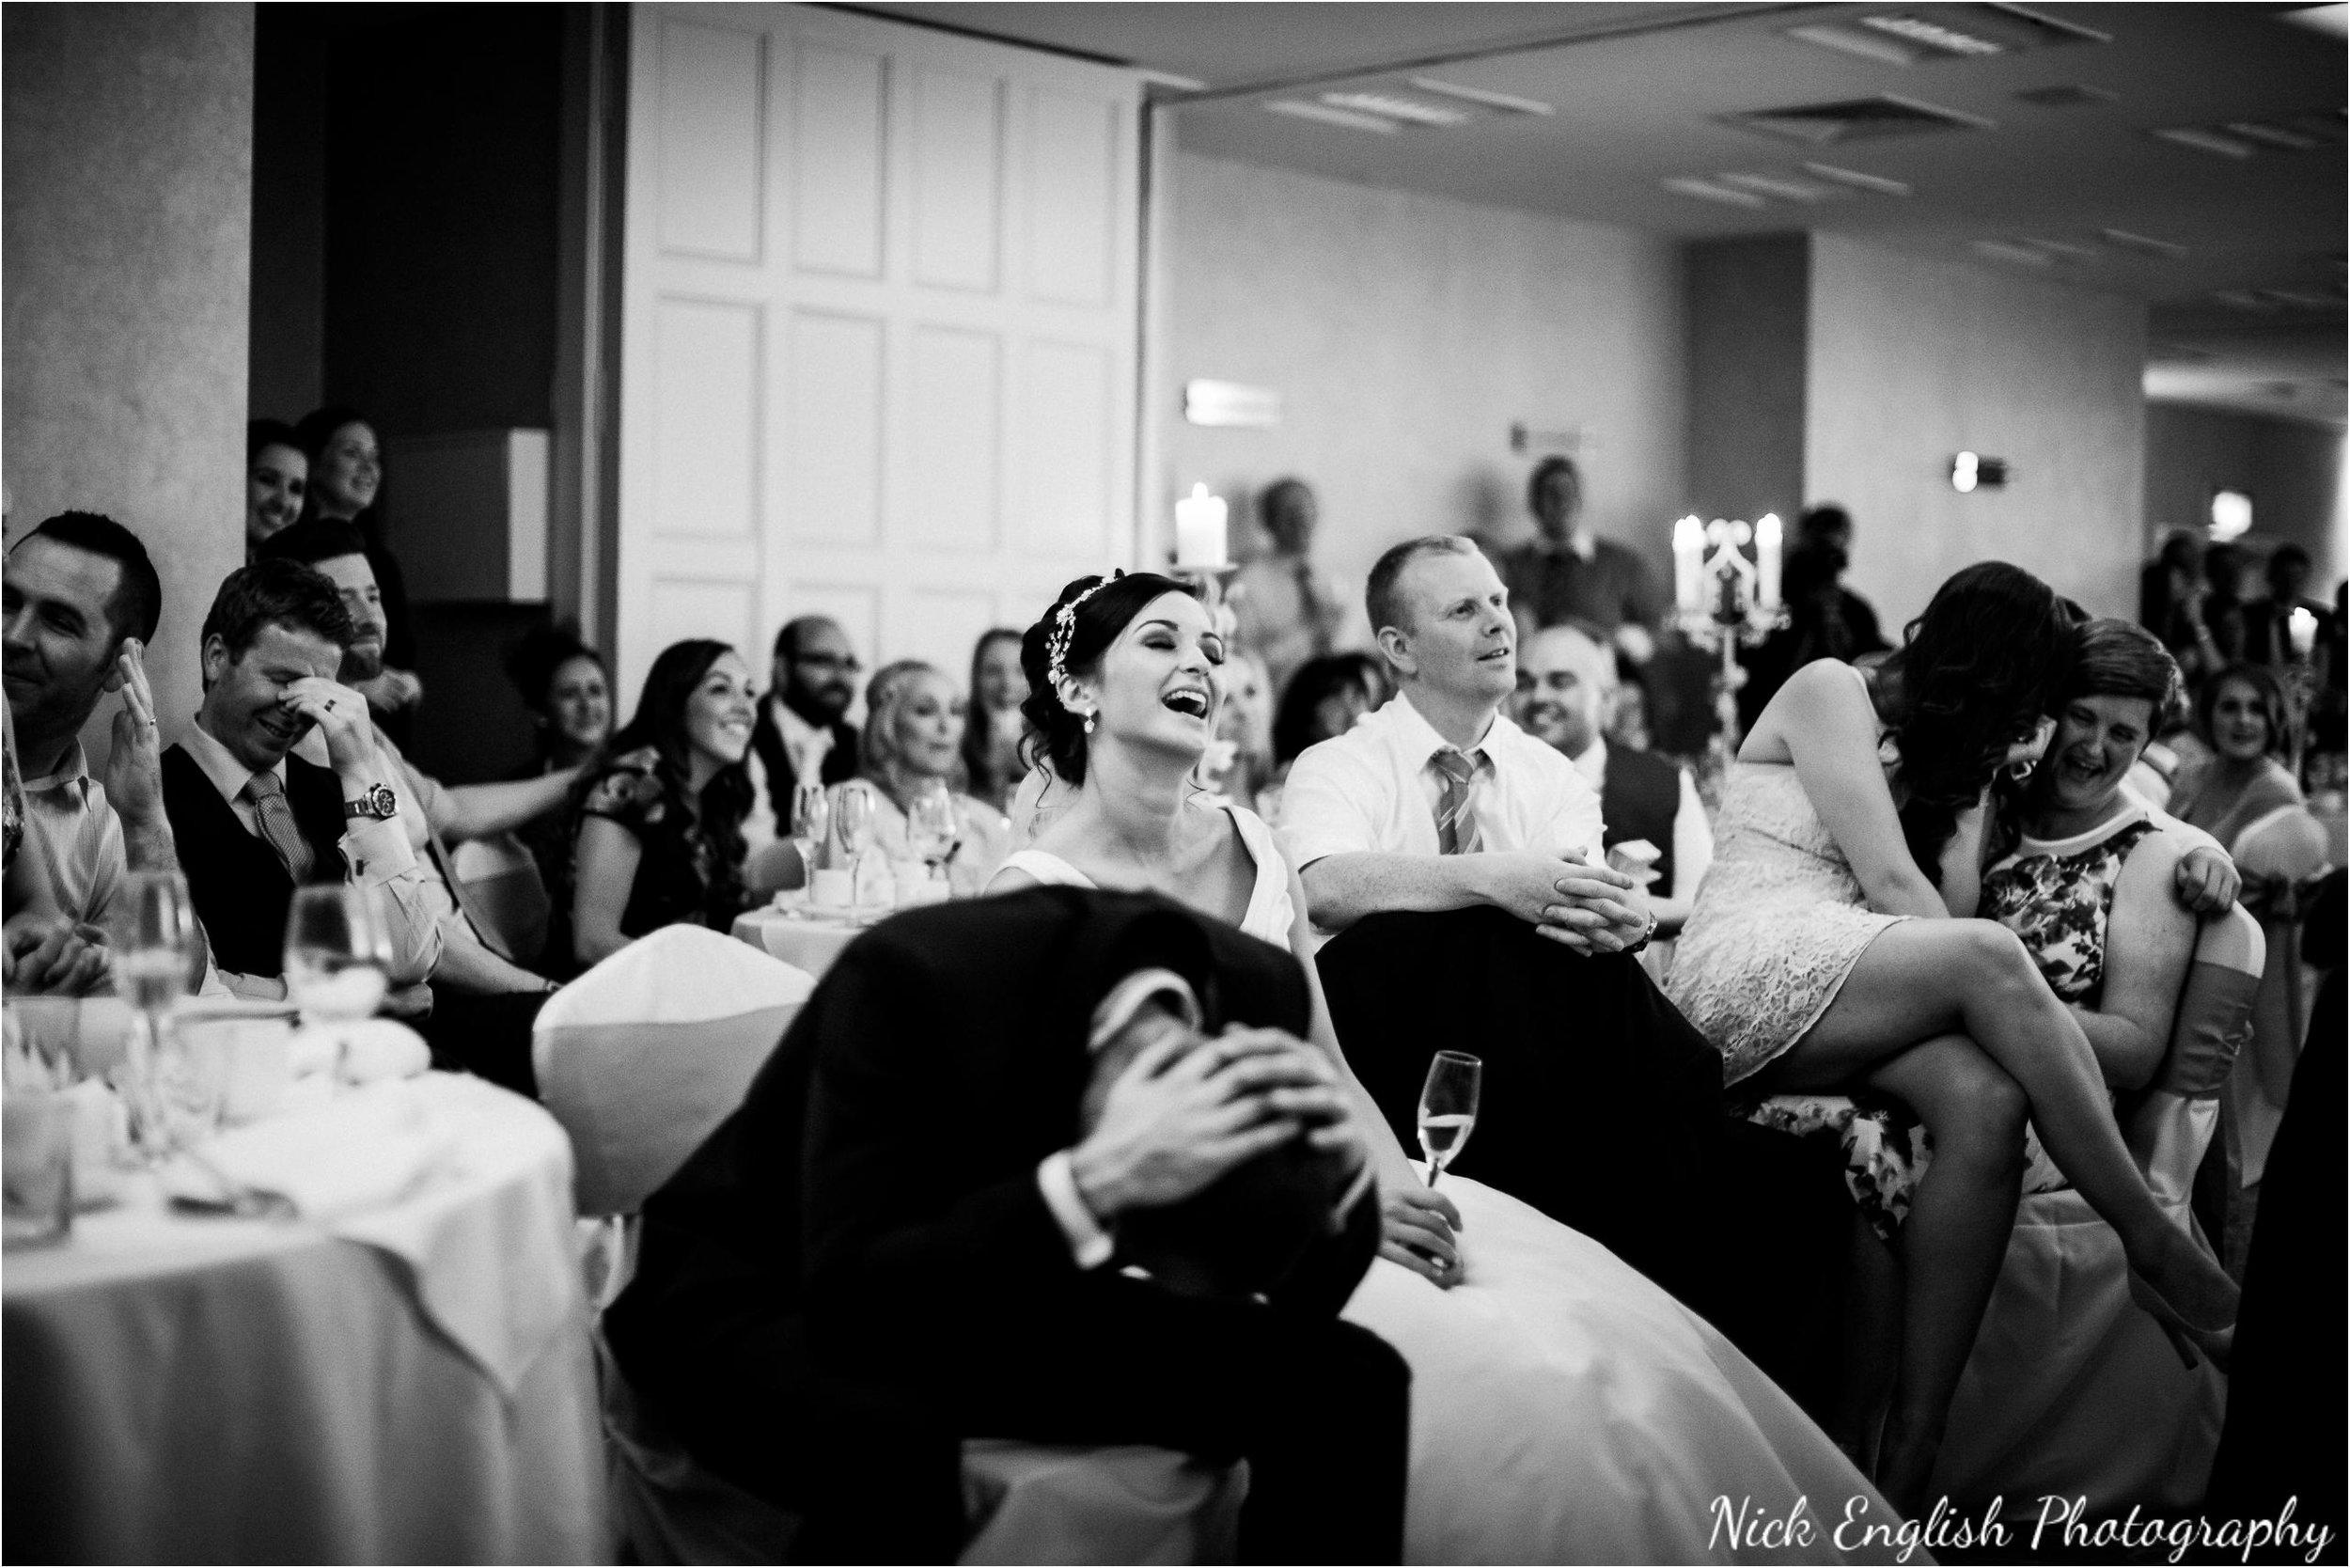 Emily David Wedding Photographs at Barton Grange Preston by Nick English Photography 188jpg.jpeg